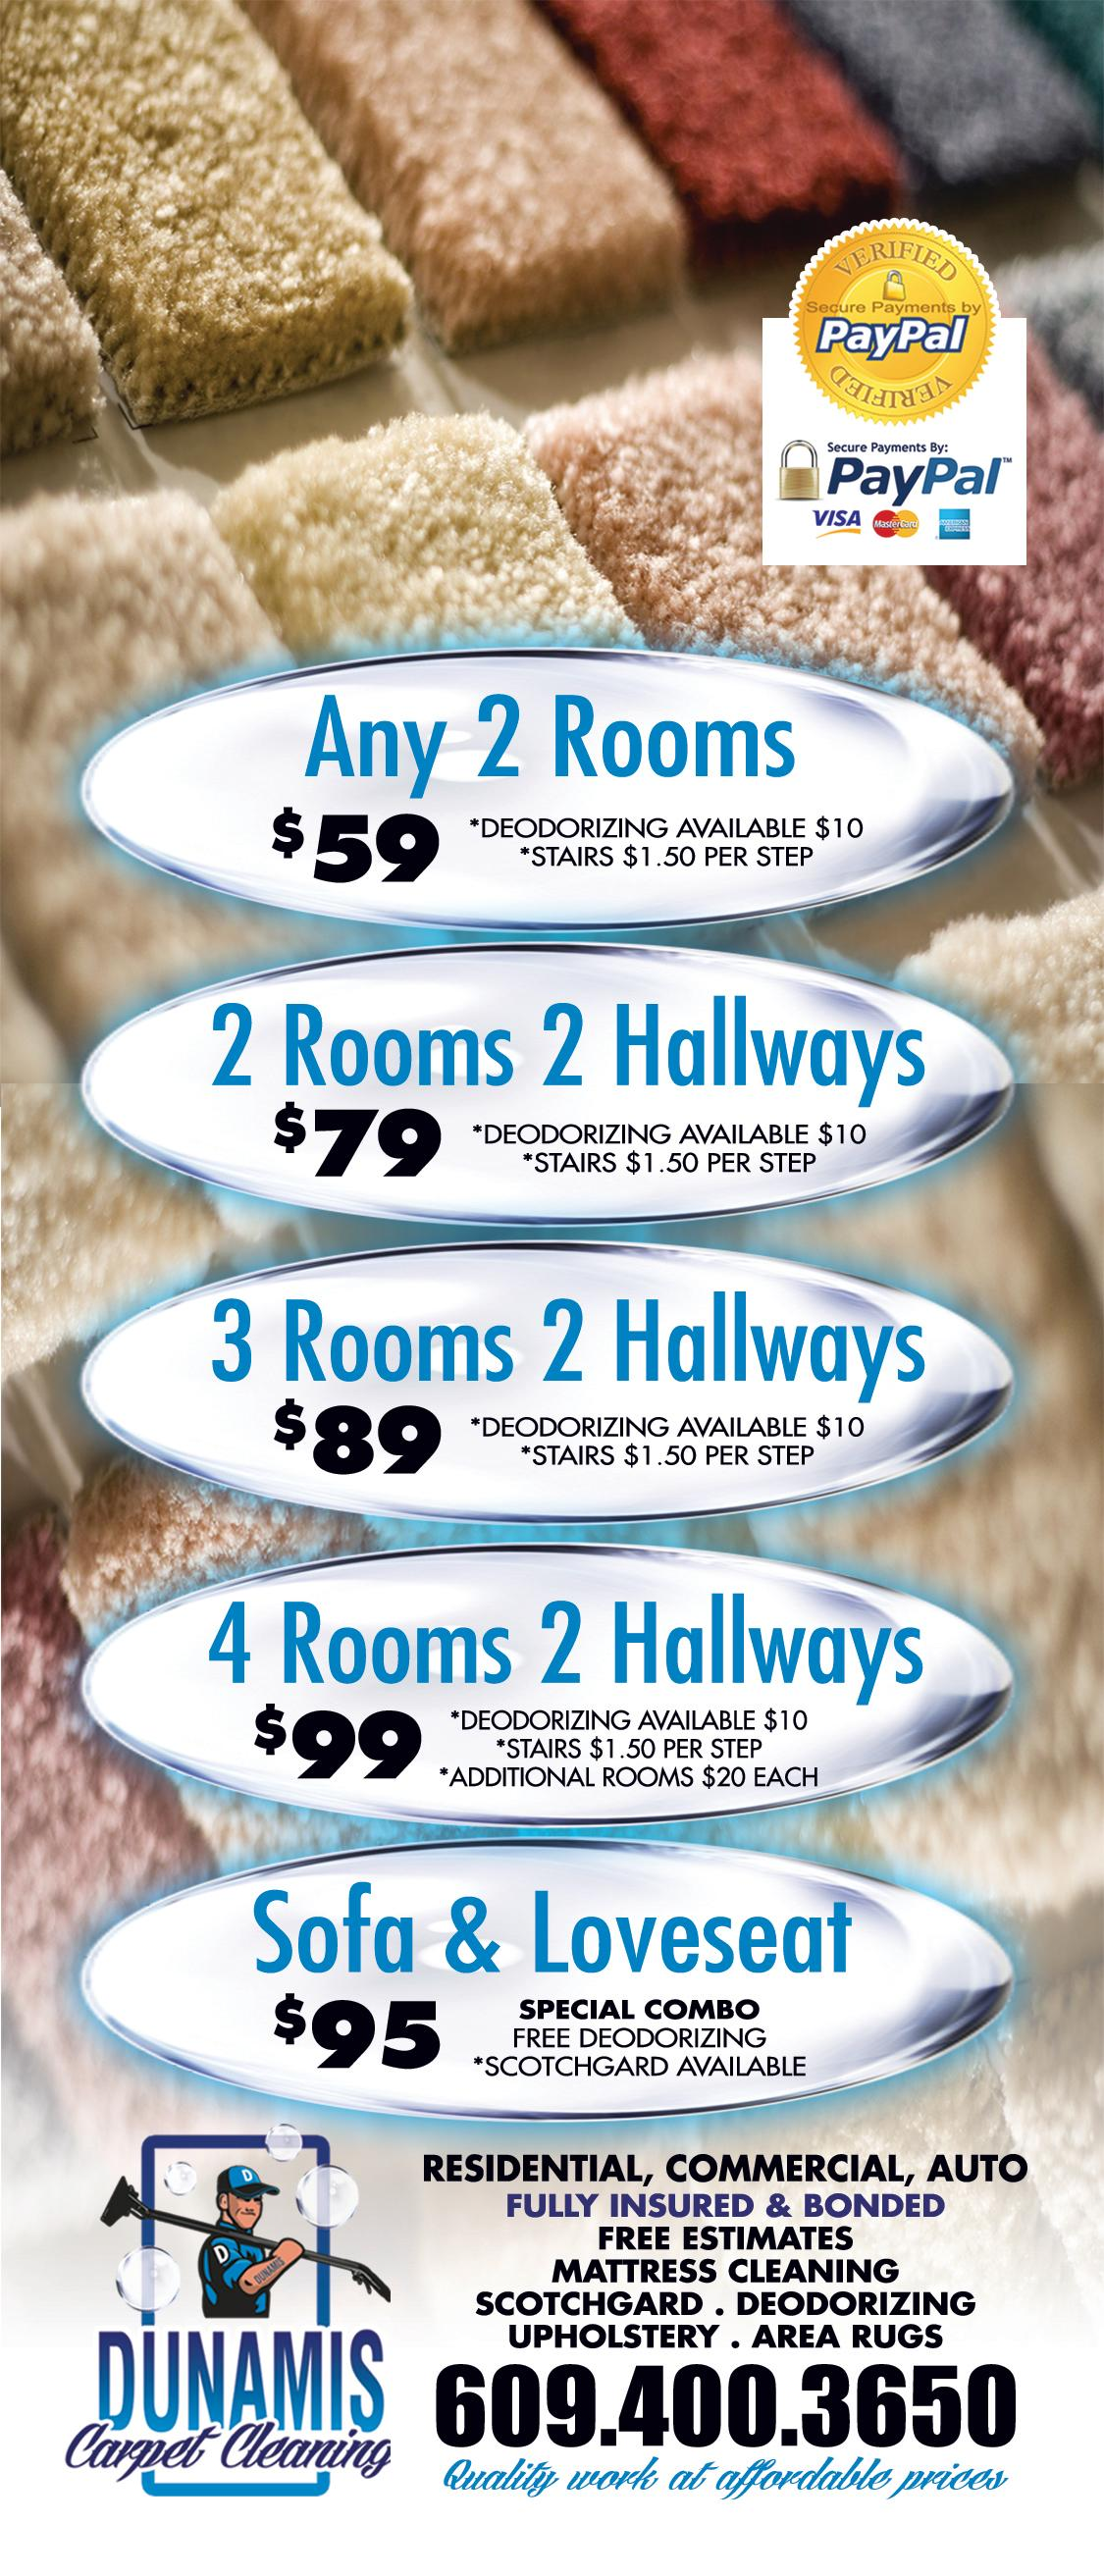 dunamis carpet cleaning galloway nj 609 400 3650. Black Bedroom Furniture Sets. Home Design Ideas